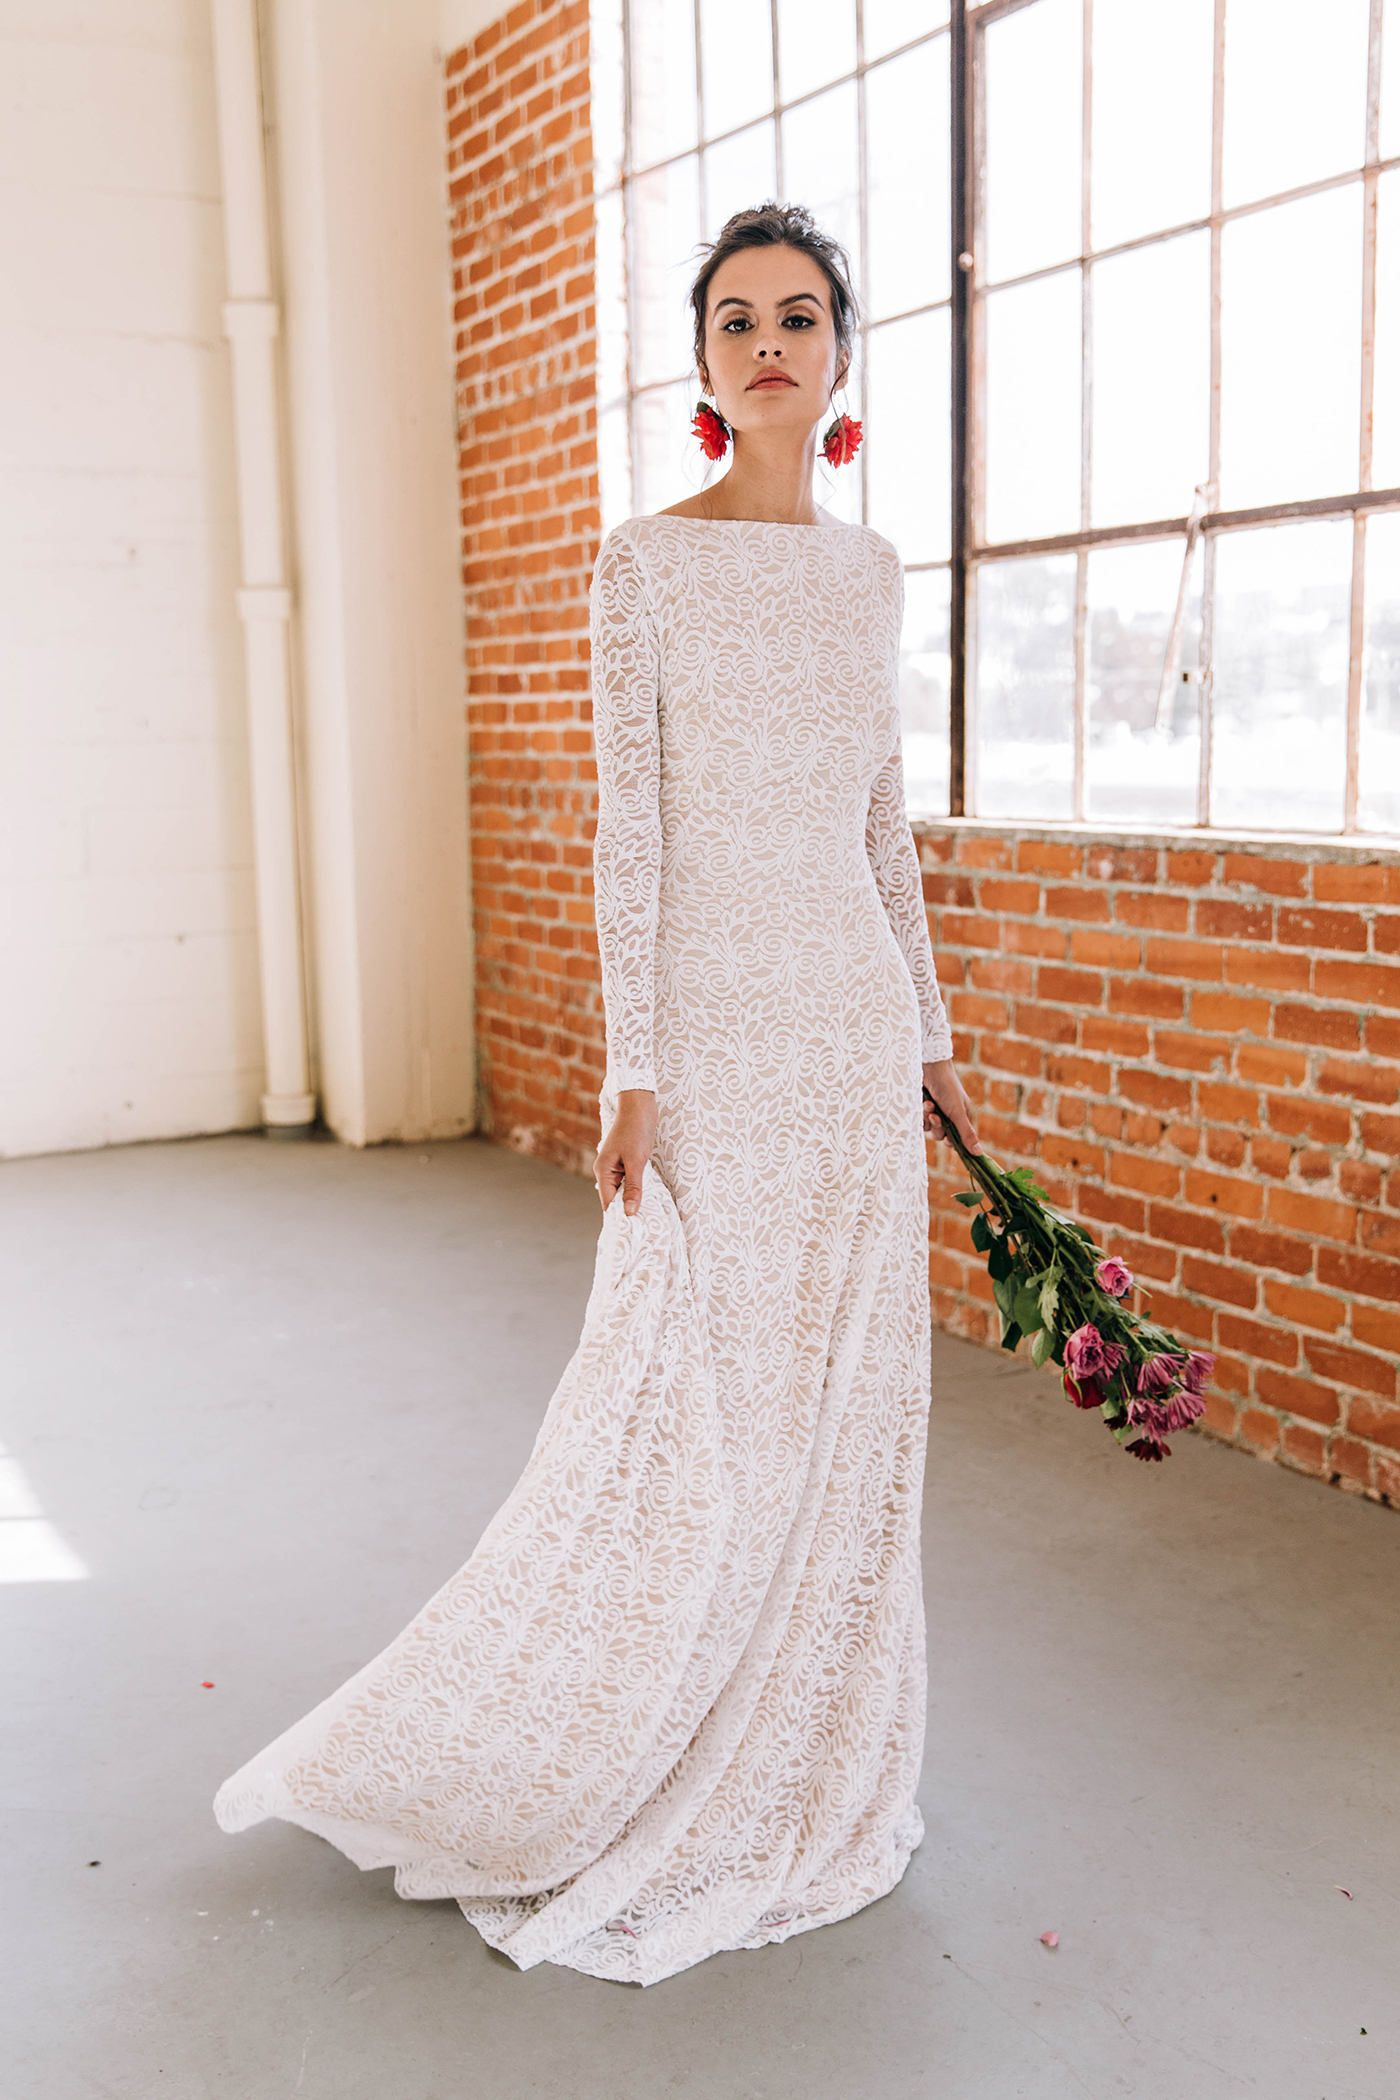 Long sleeve wedding dress modern wedding dress minimalist wedding